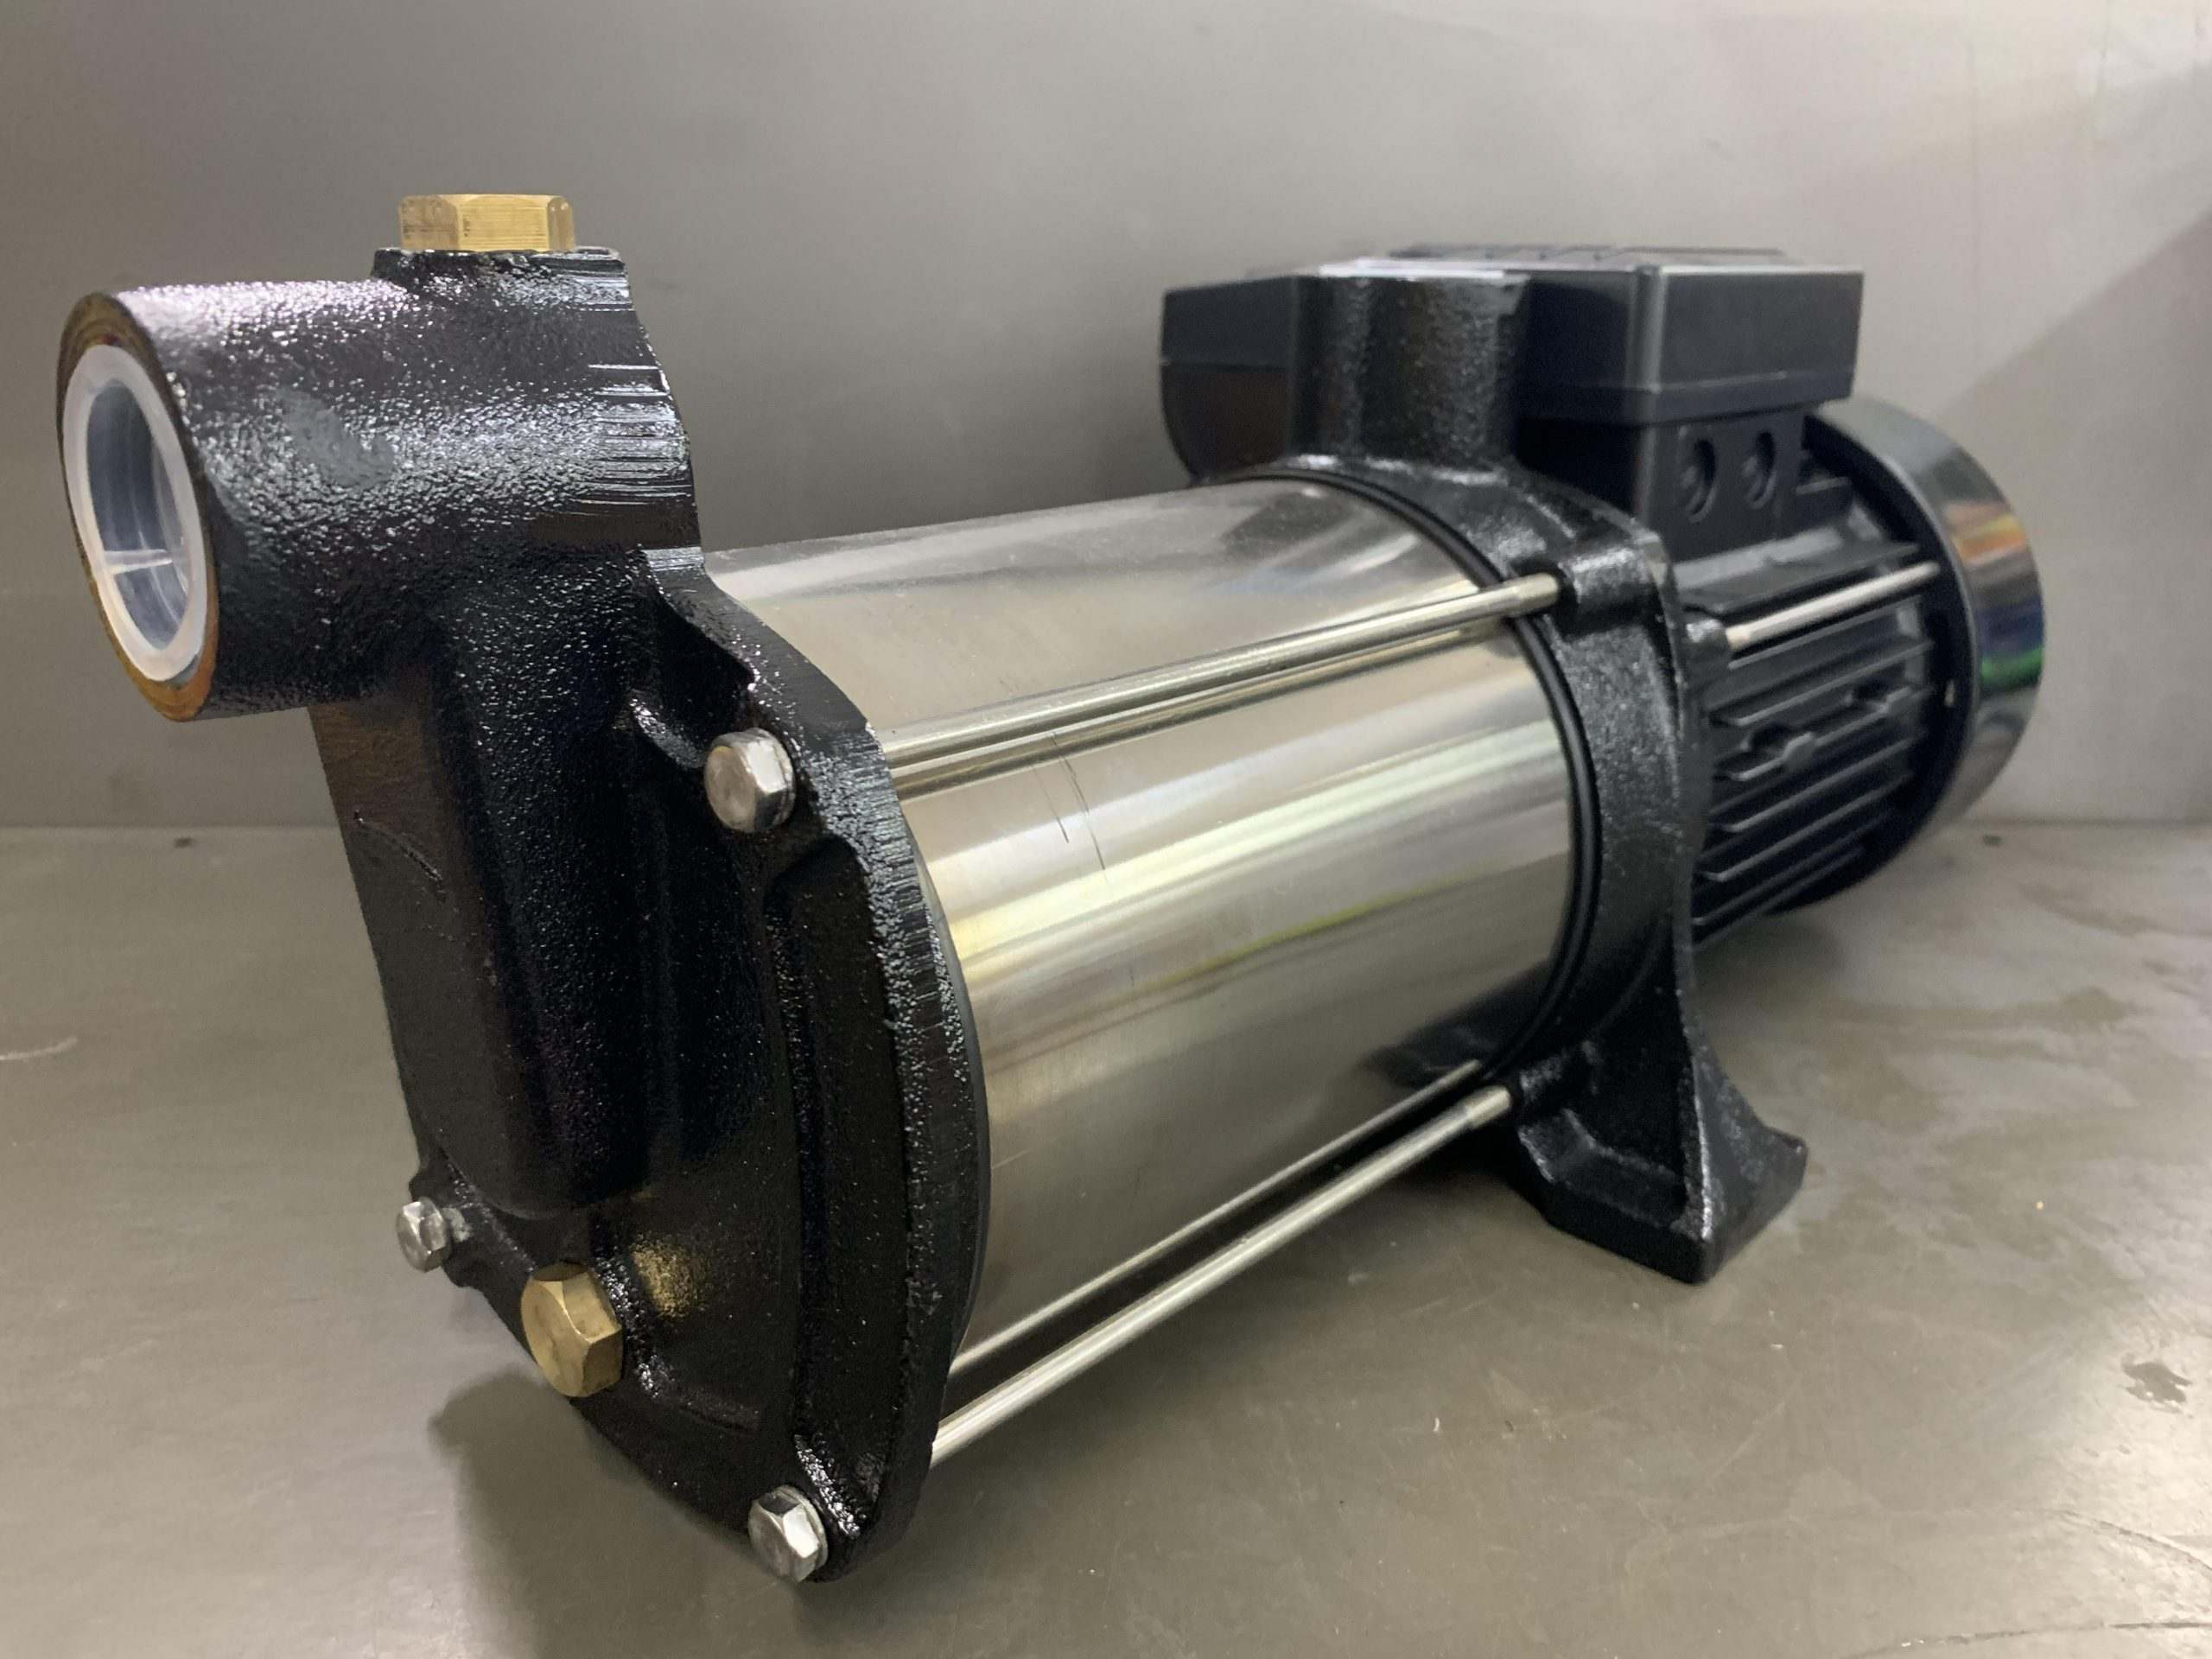 Eletrobomba 5 turbinas 5400l/h  eh125 hidrobex